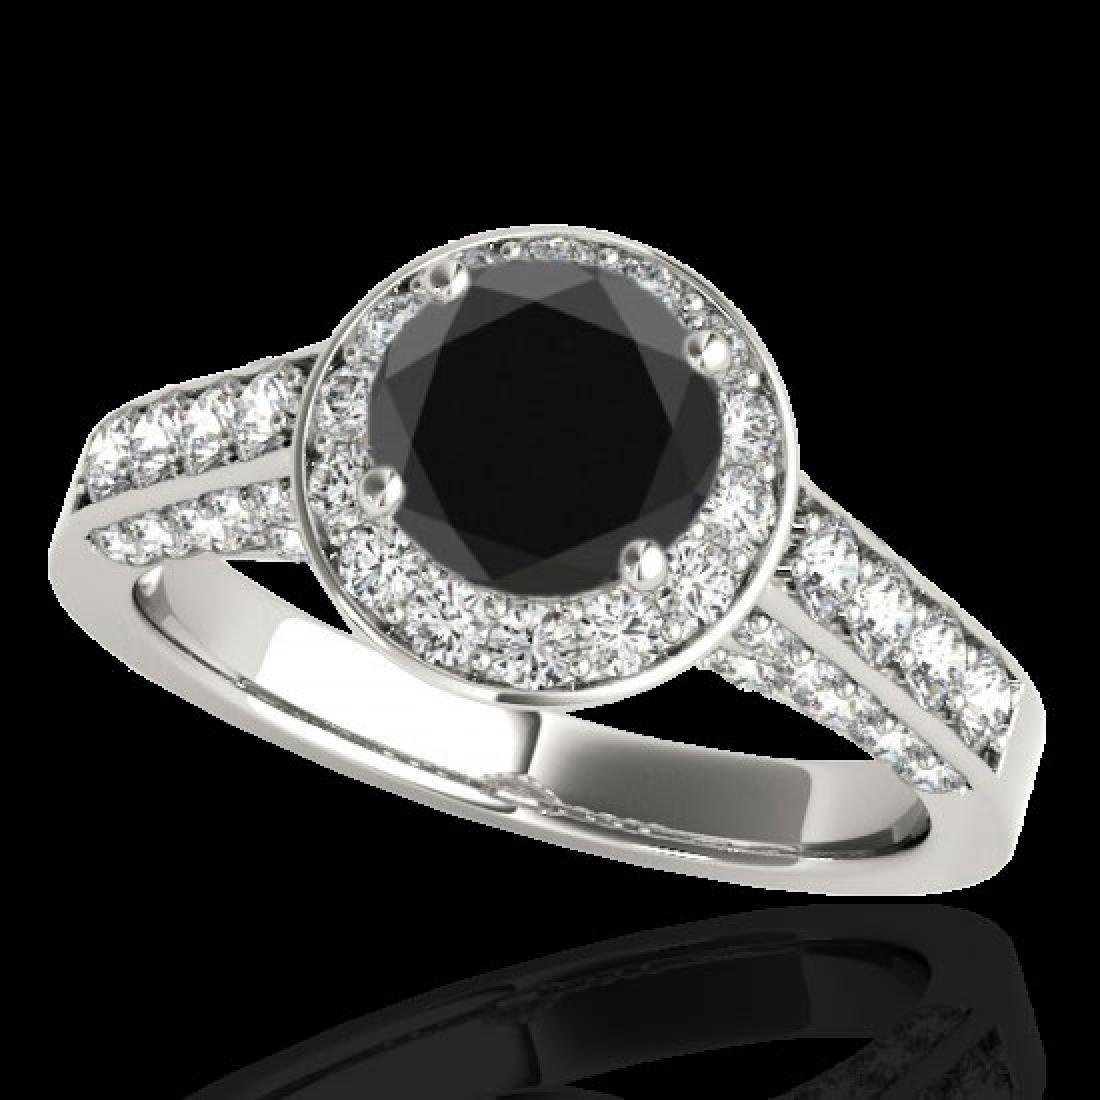 2.56 CTW Certified VS Black Diamond Solitaire Halo Ring